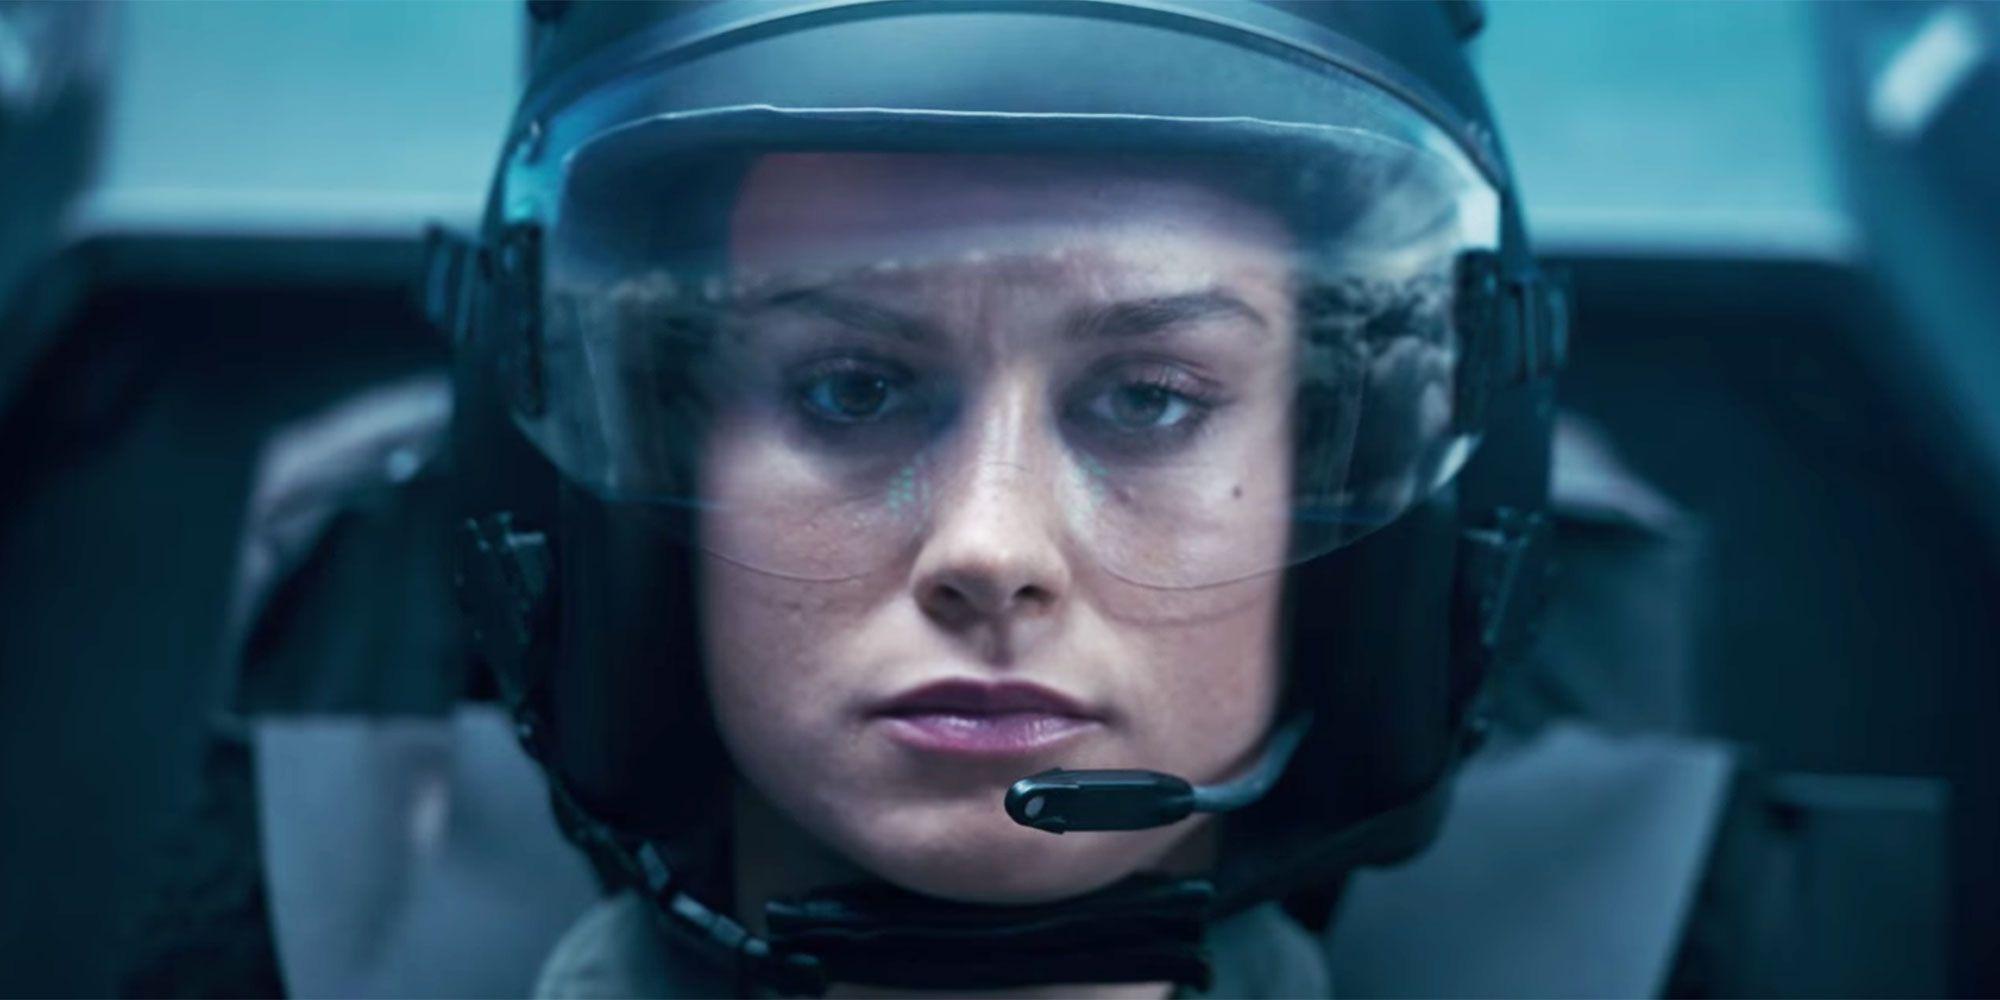 Carol as an Air Force pilot.